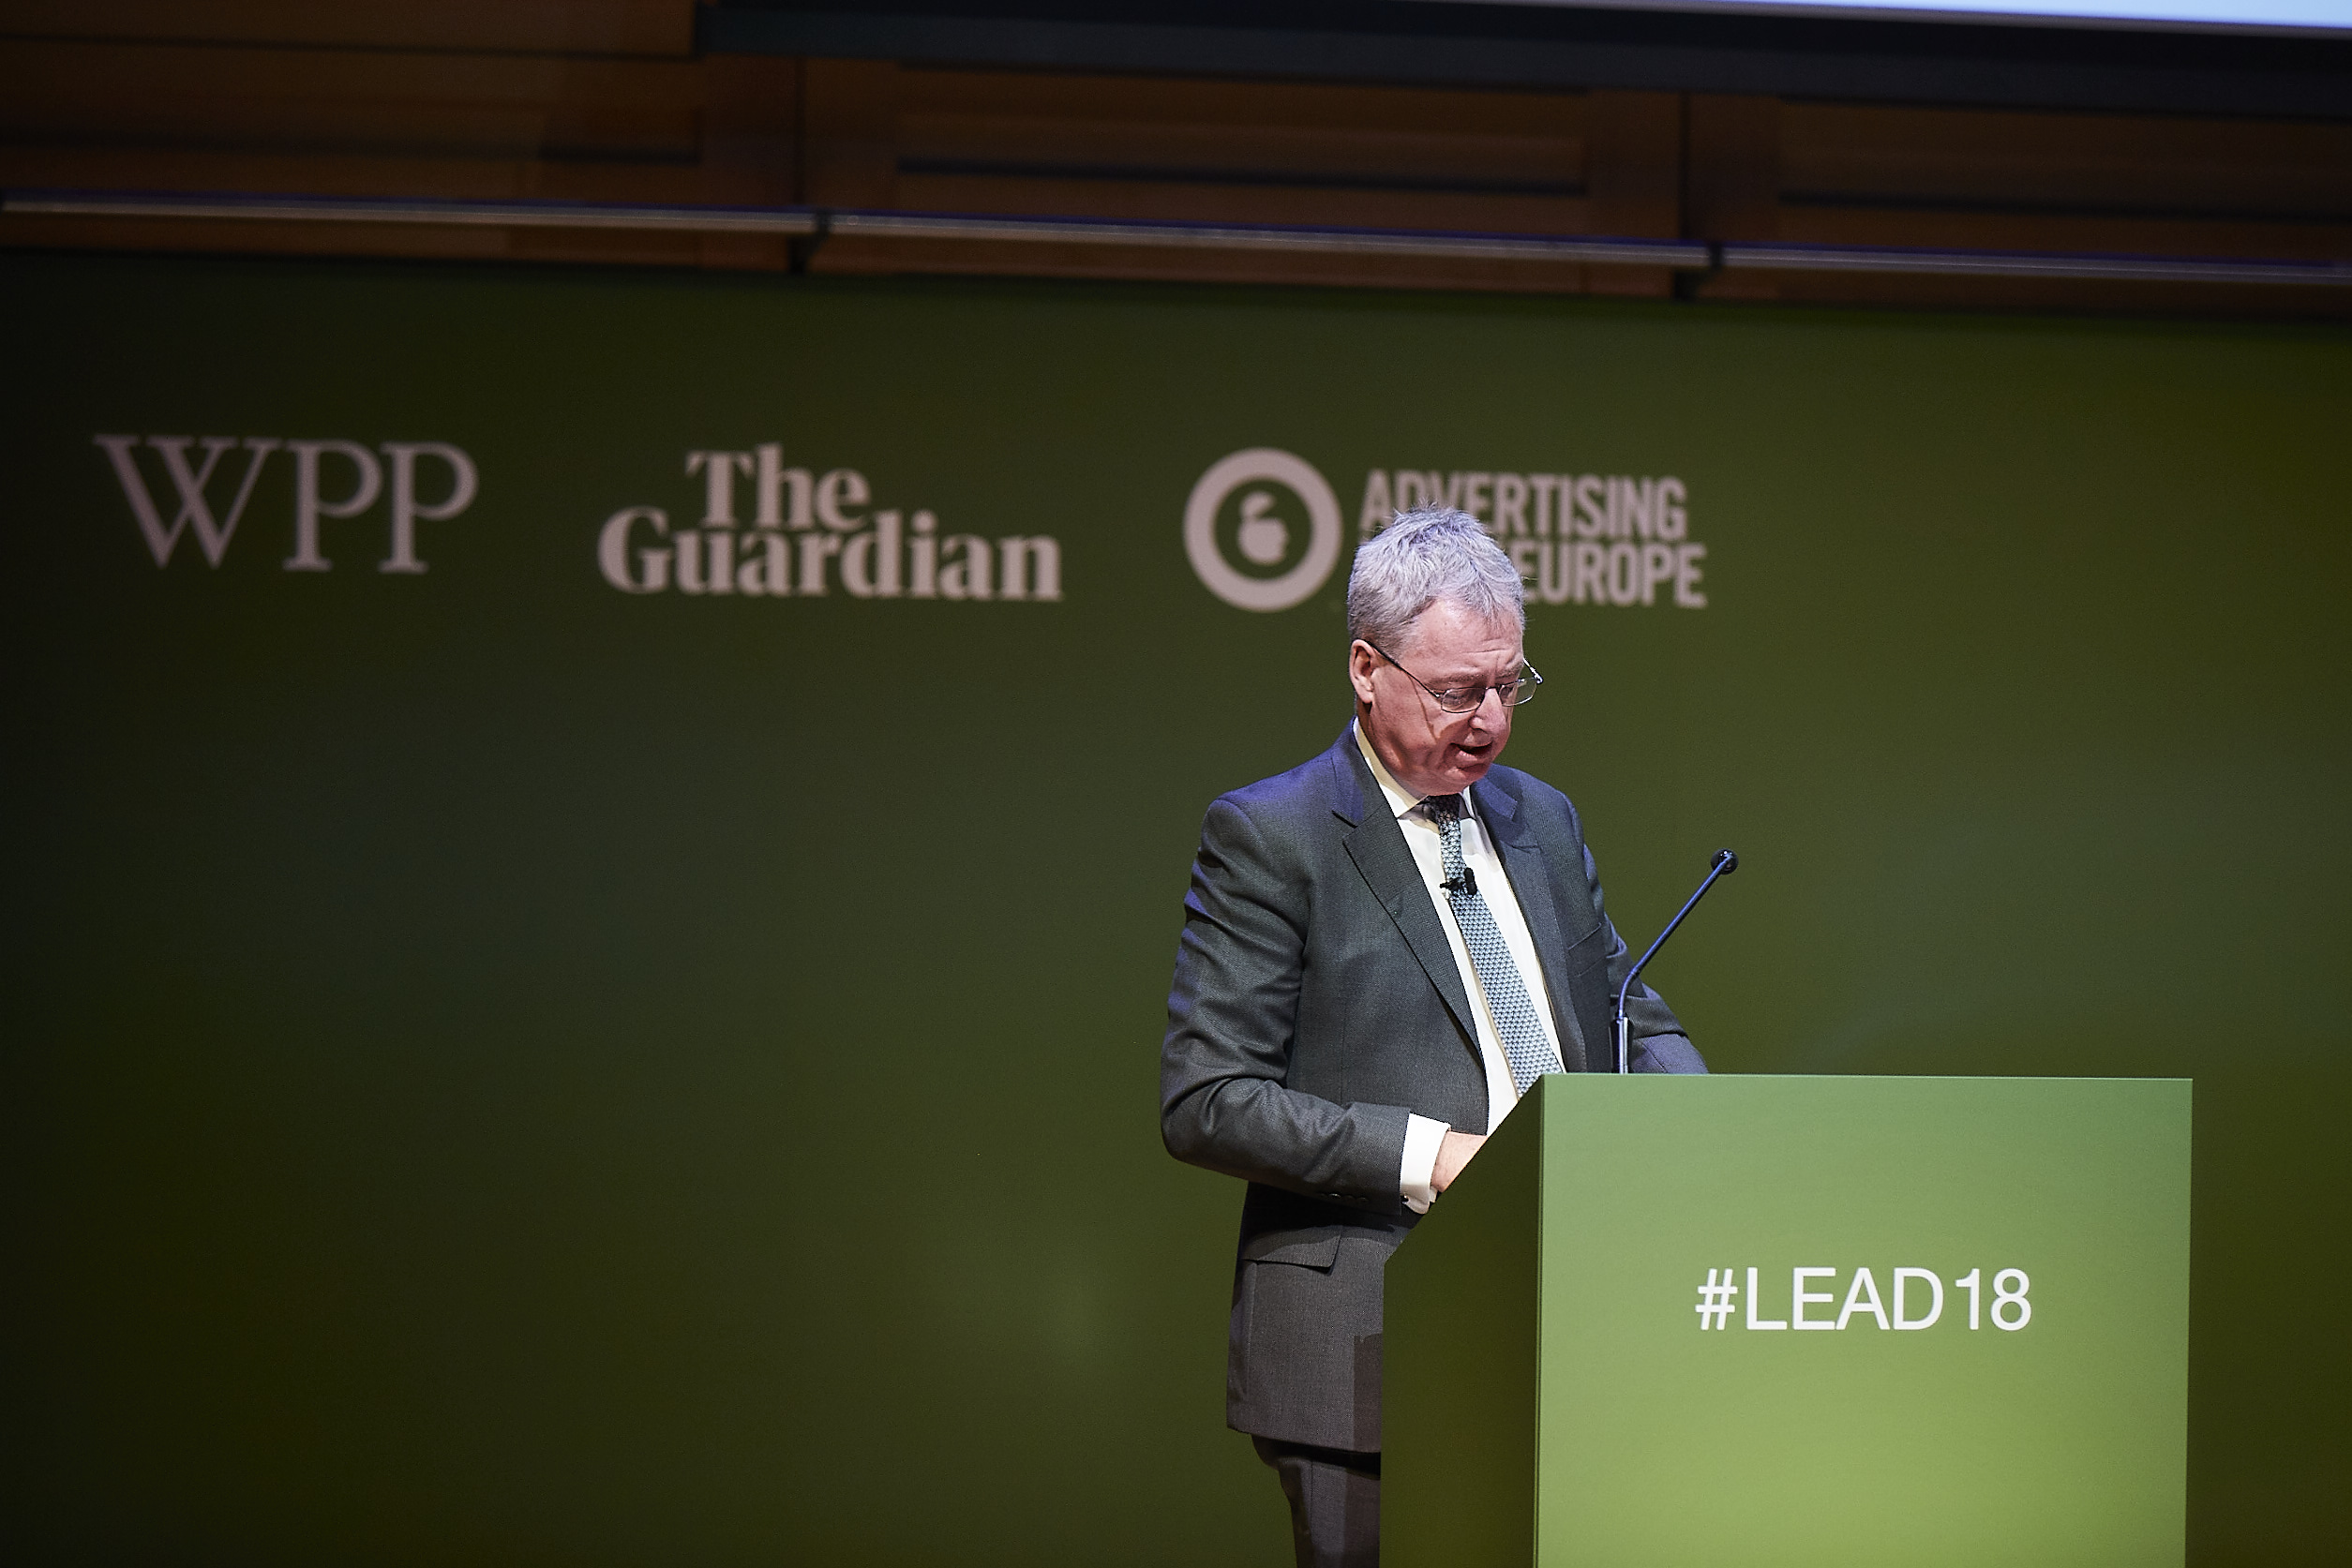 Advertising Association LEAD 2018